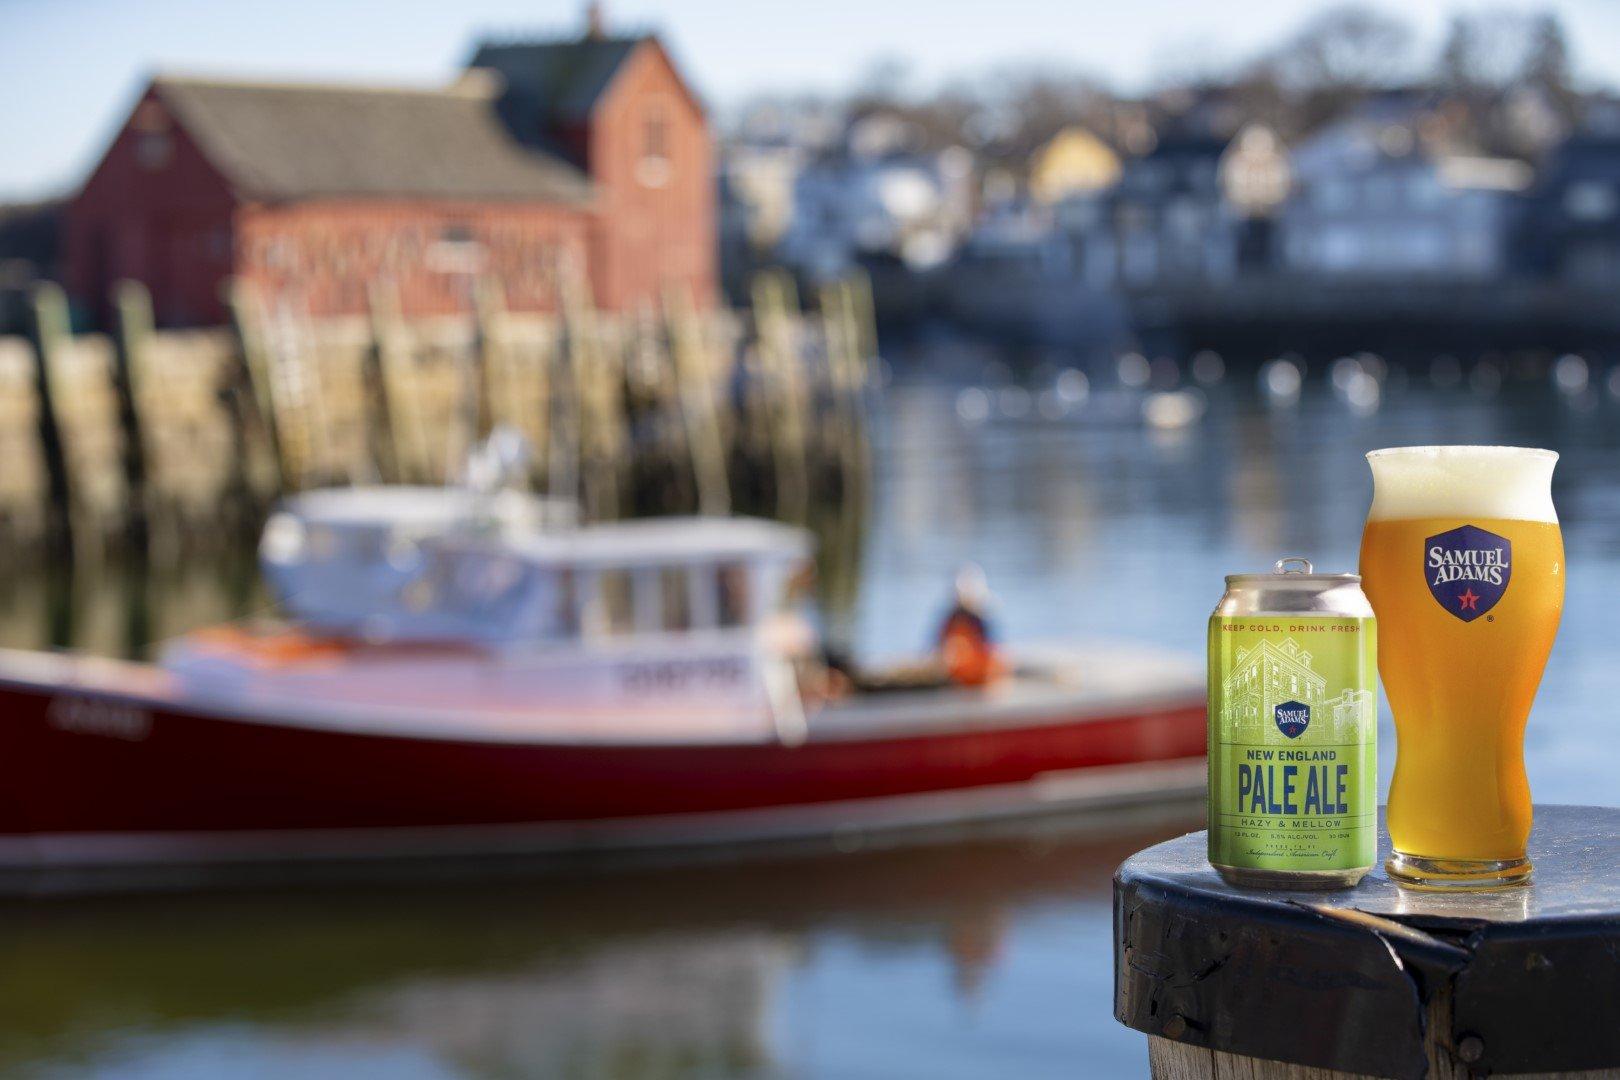 Samuel Adams New England Pale Ale